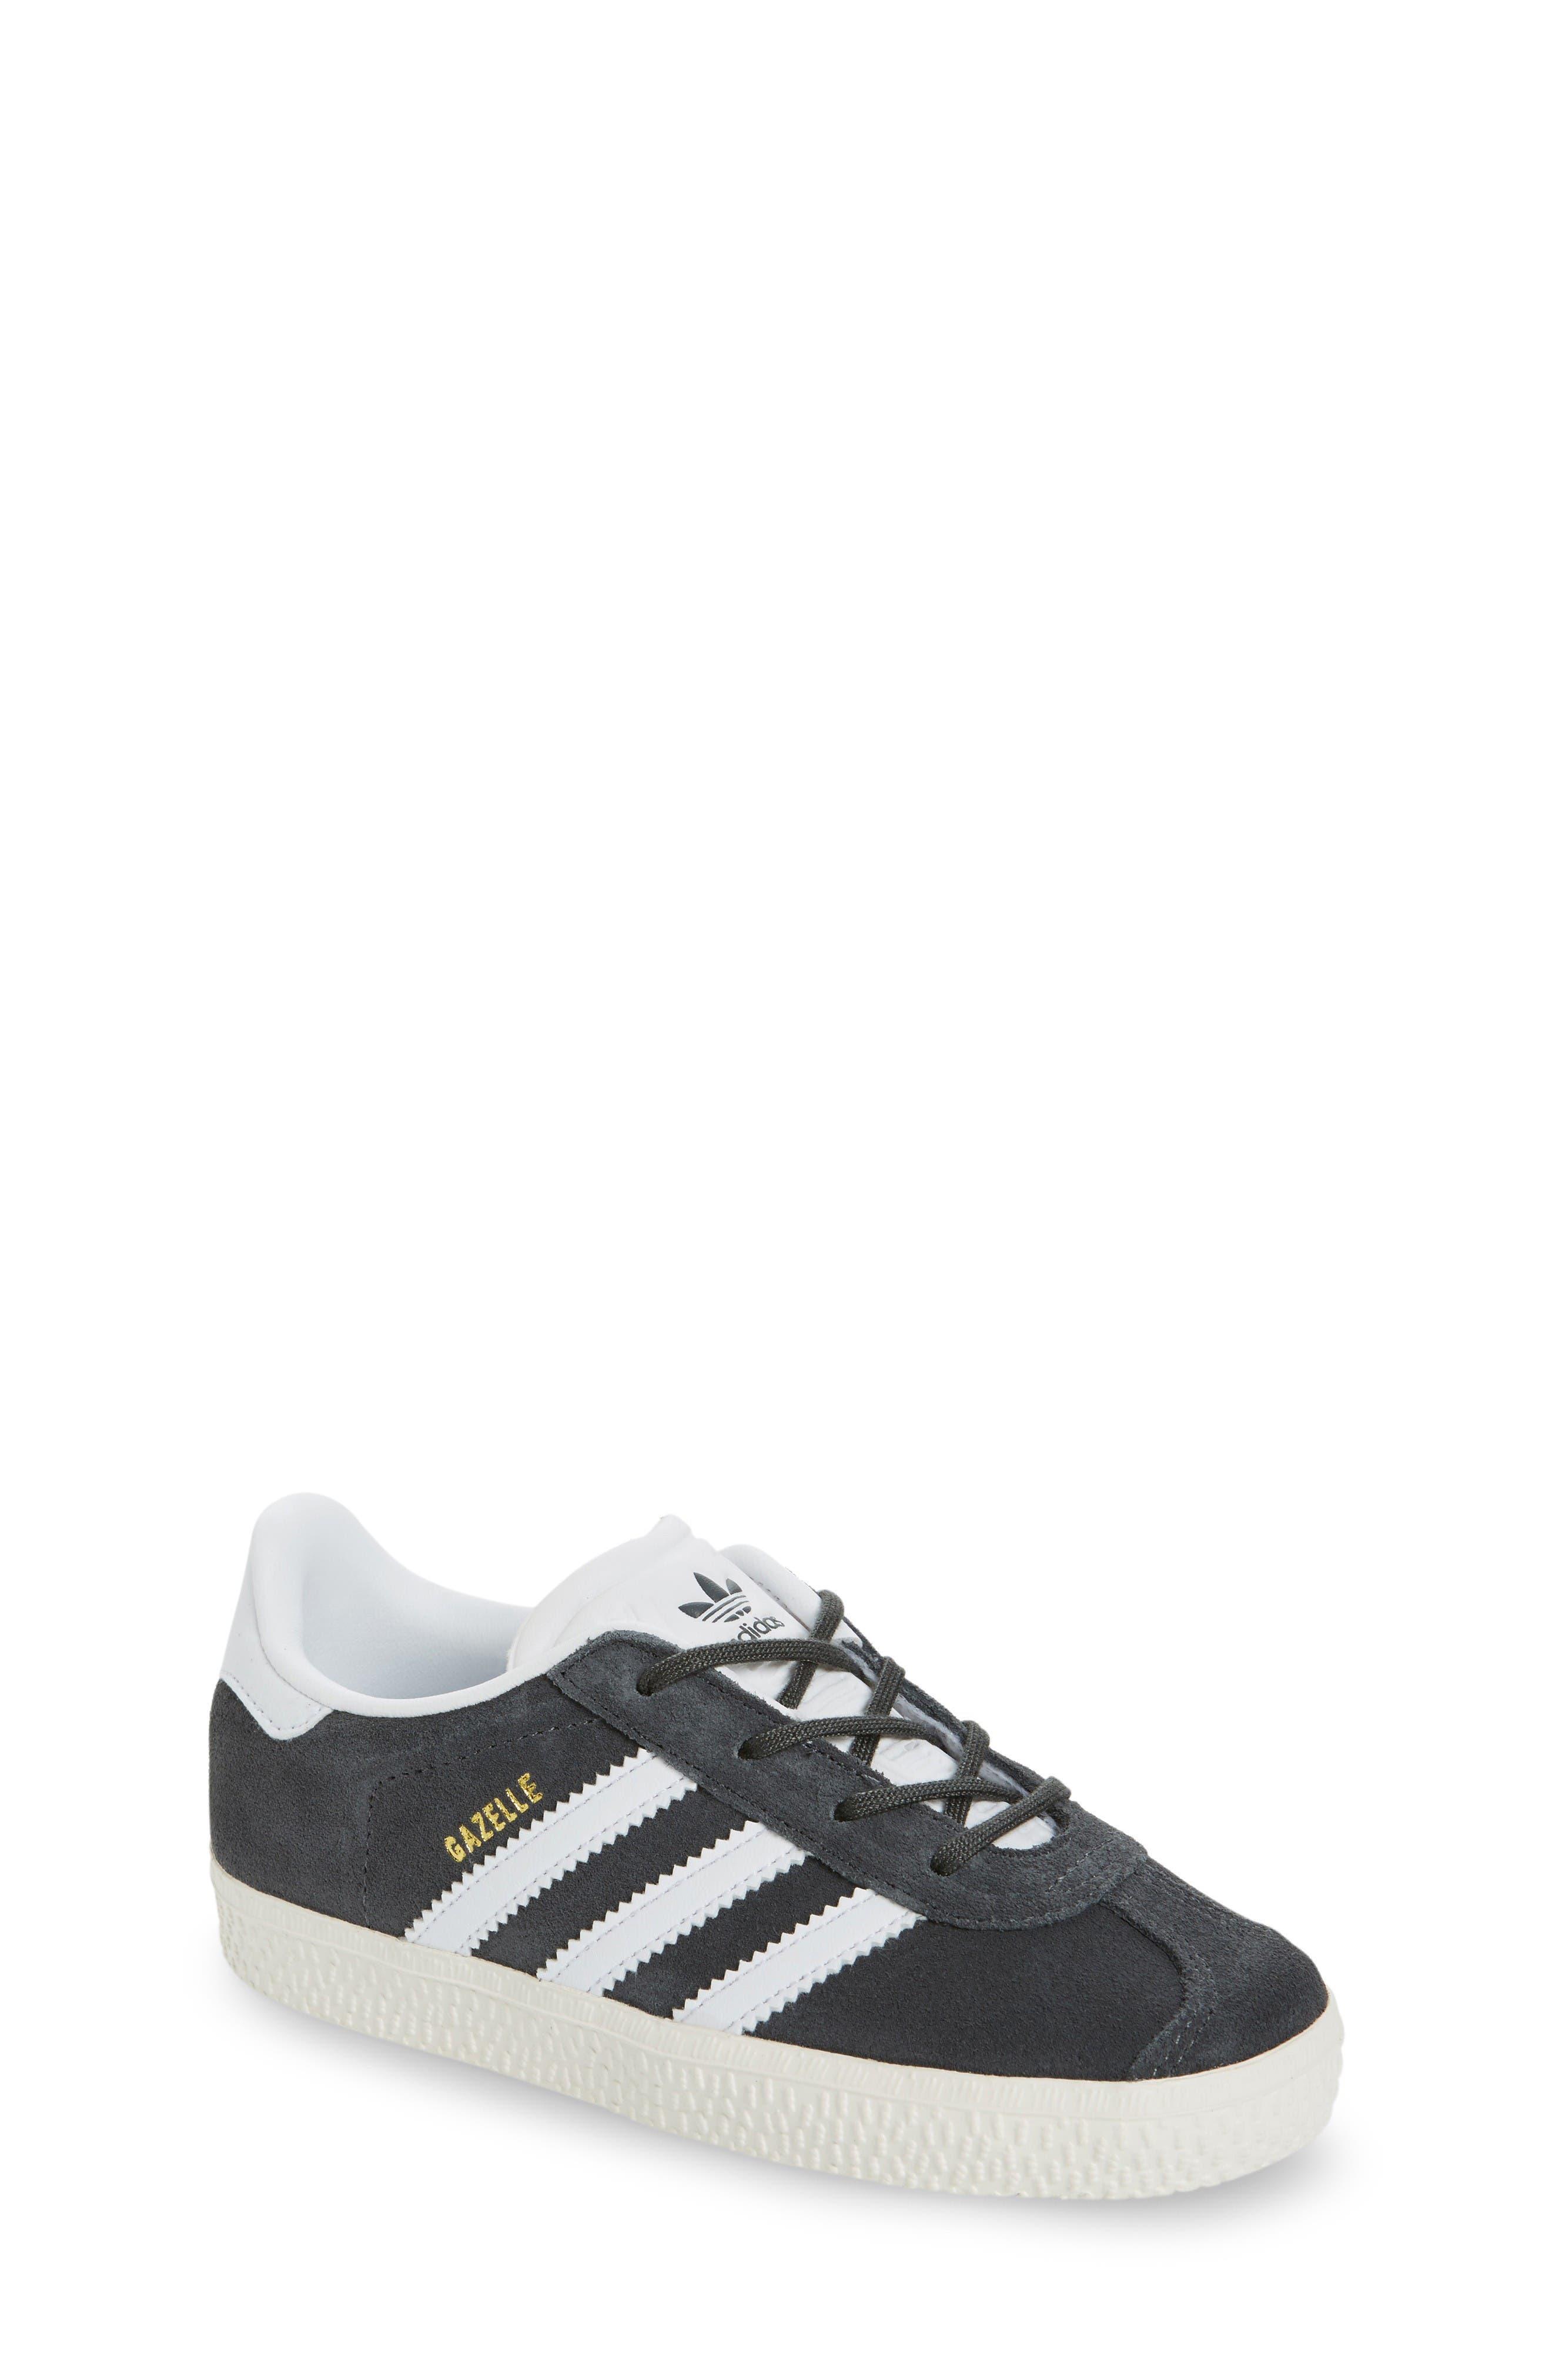 Alternate Image 1 Selected - adidas Gazelle Sneaker (Baby, Walker & Toddler)